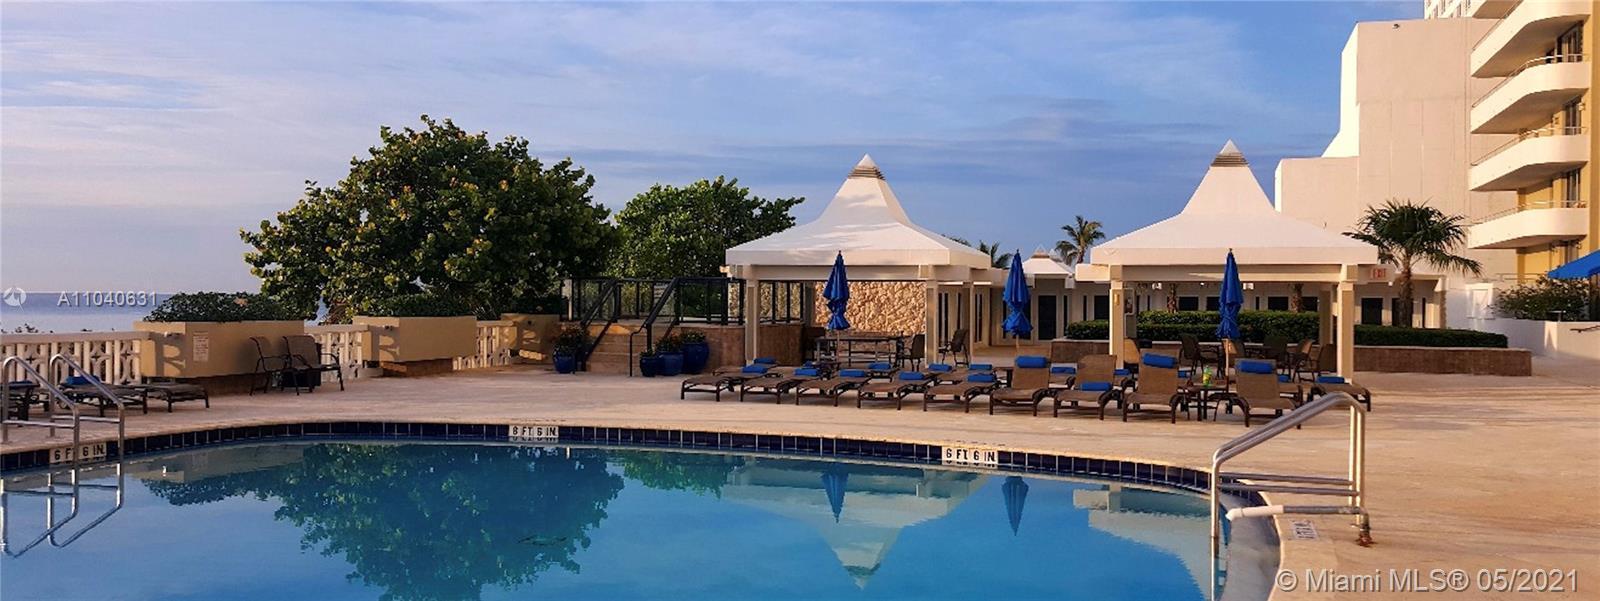 Oceanside Plaza - Квартиры на берегу океана на продажу